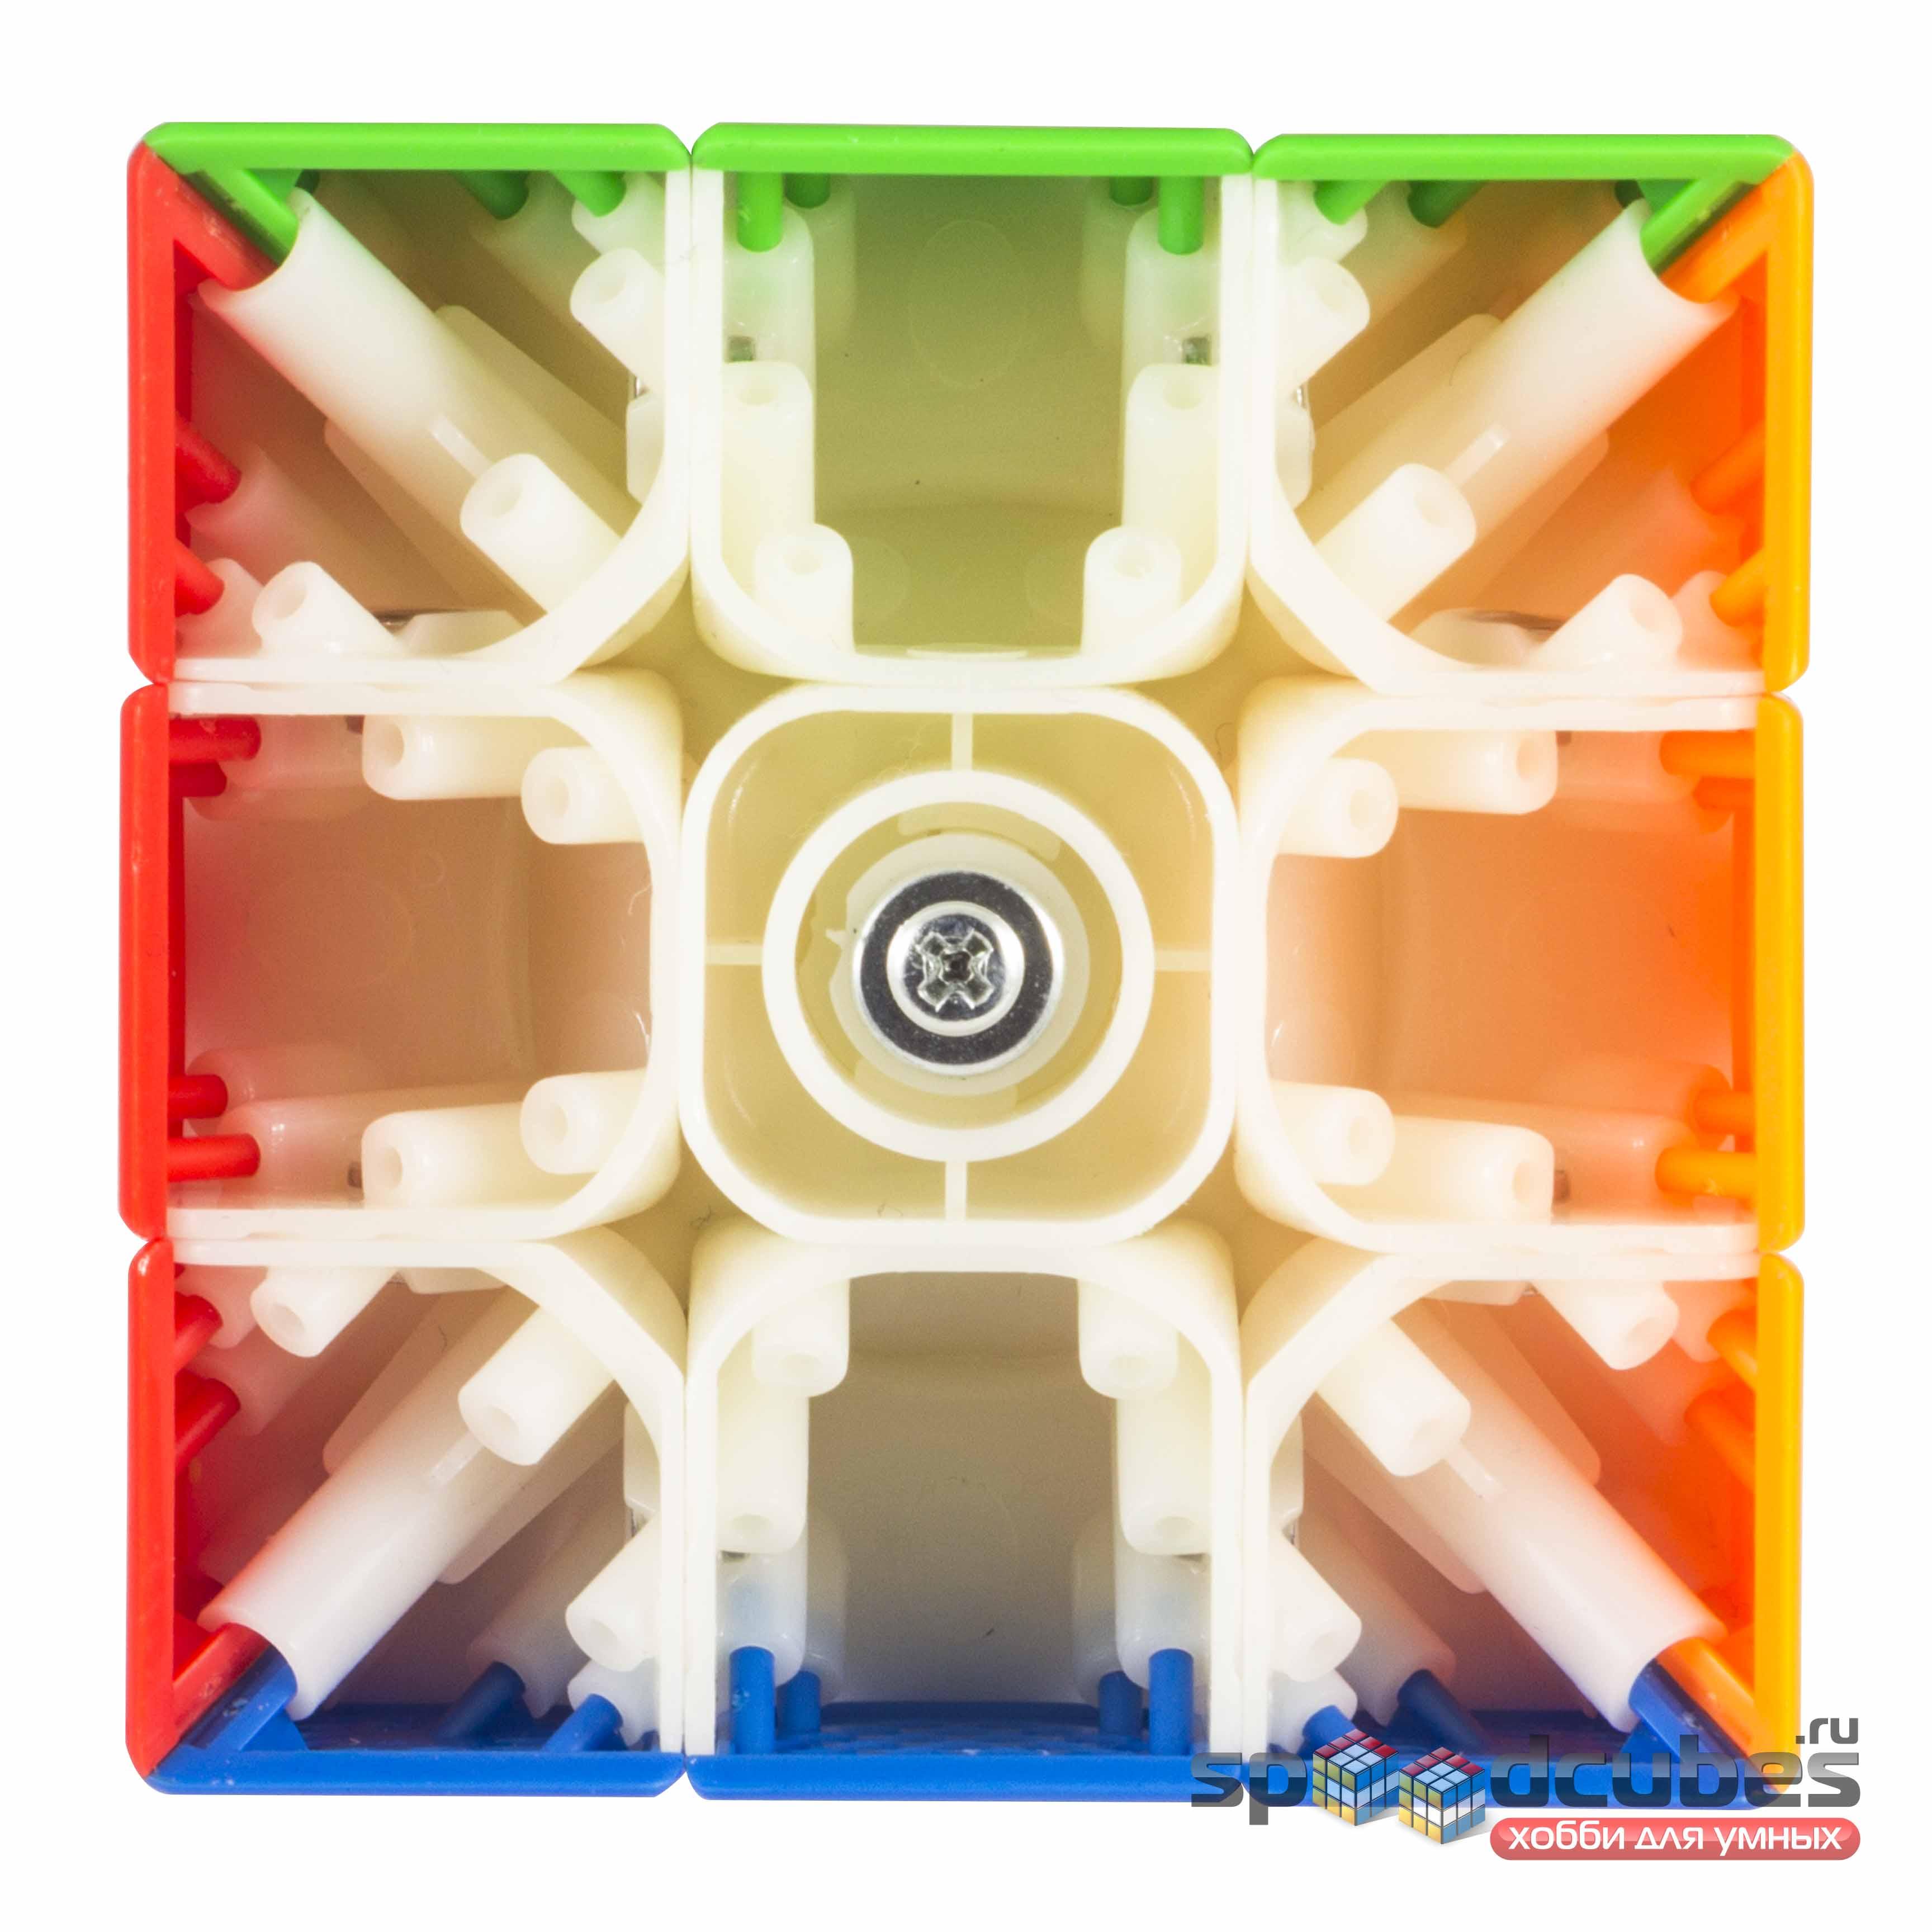 YJ MGC 3x3x3 V2 Color 6